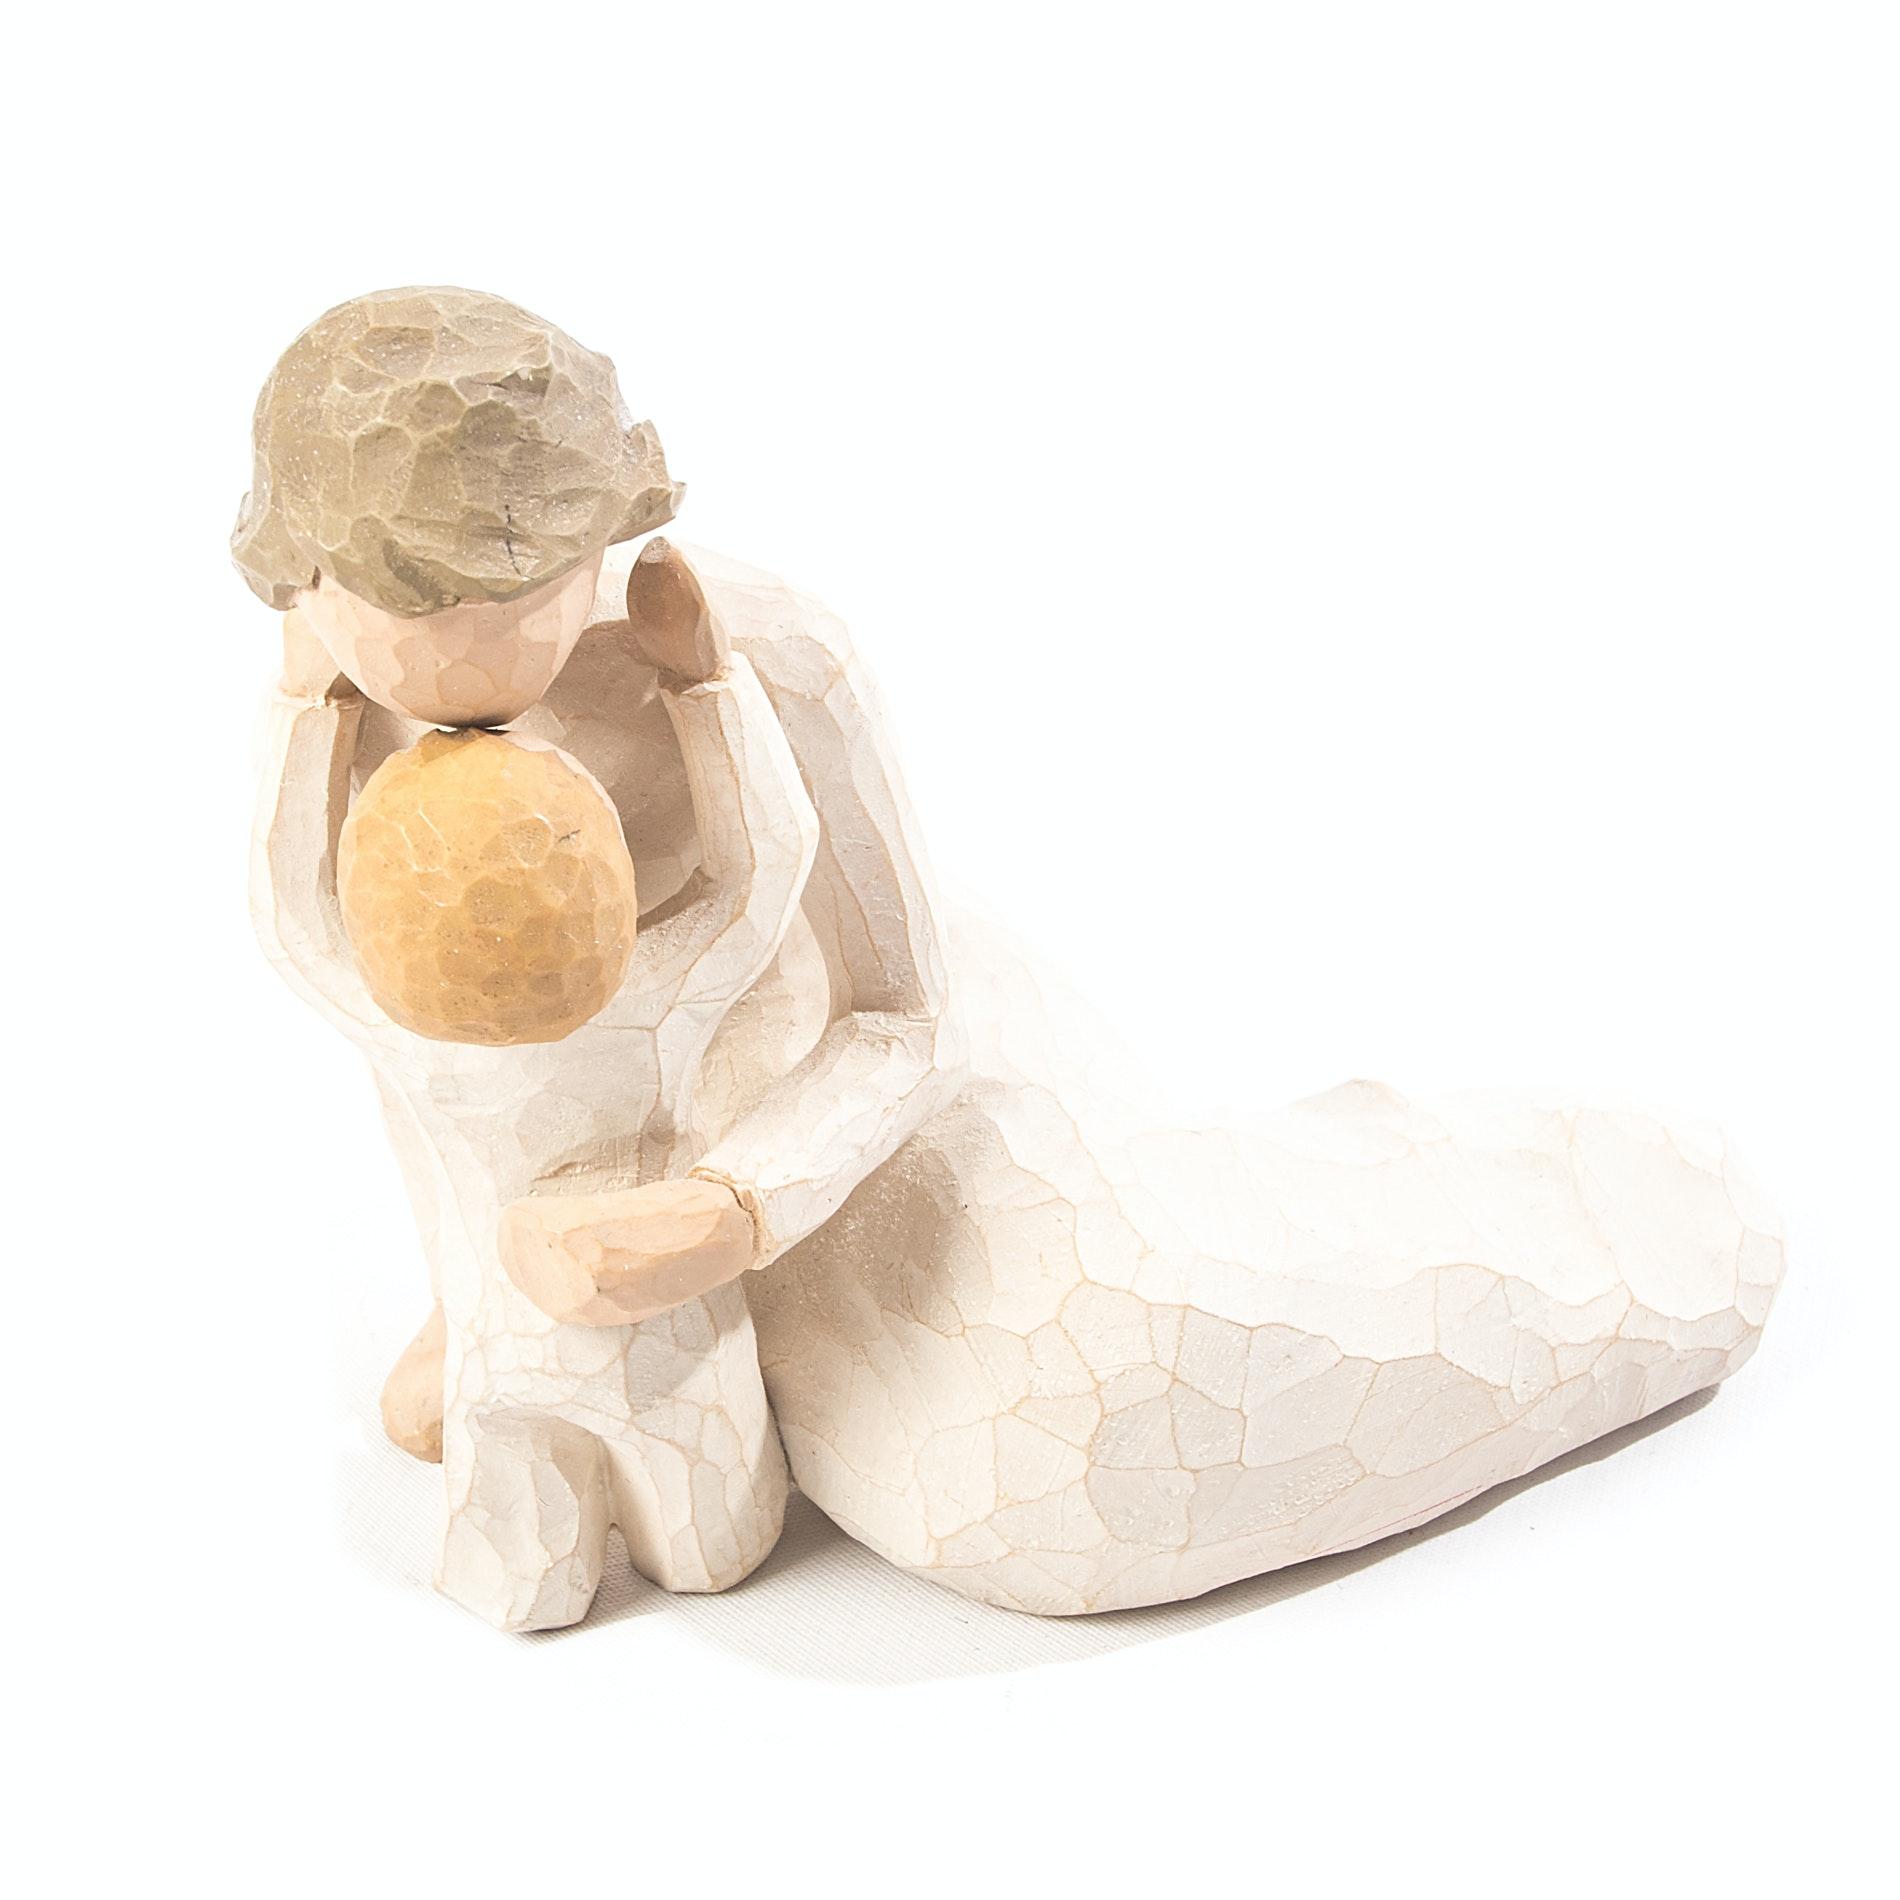 "Demdaco Willow Tree ""Child's Touch"" Figurine"